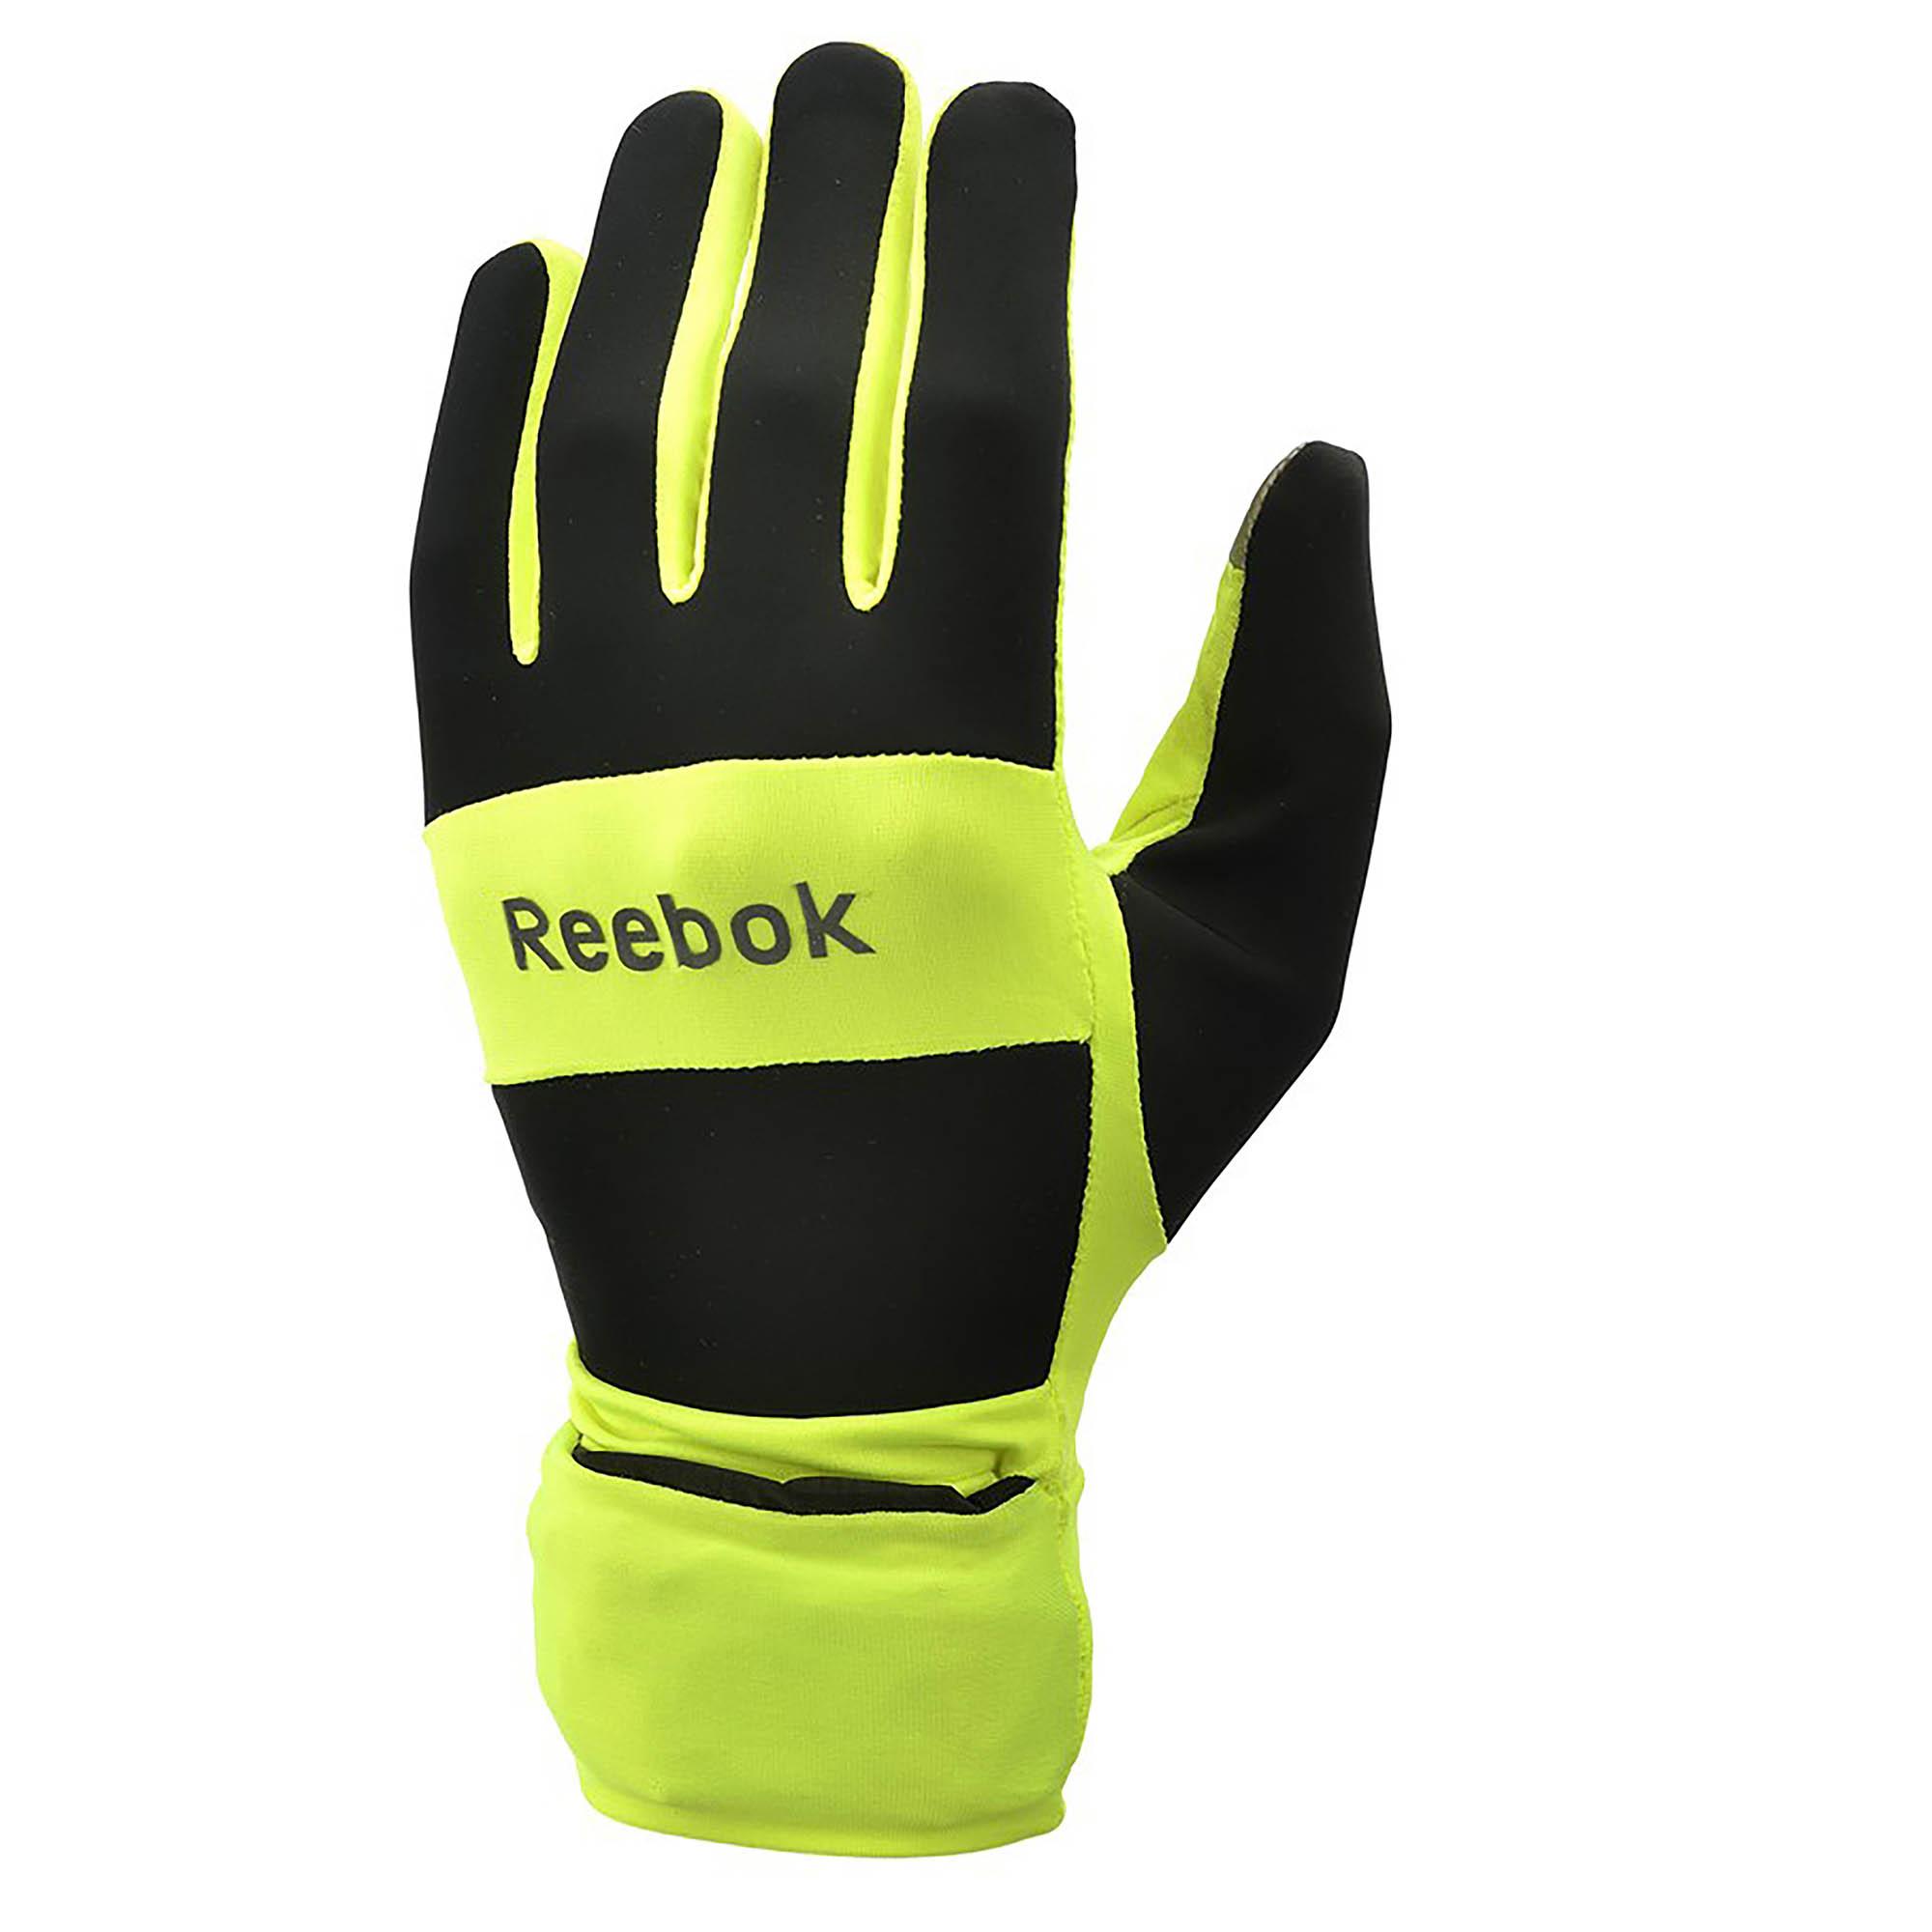 Reebok All-Weather Running Gloves - M